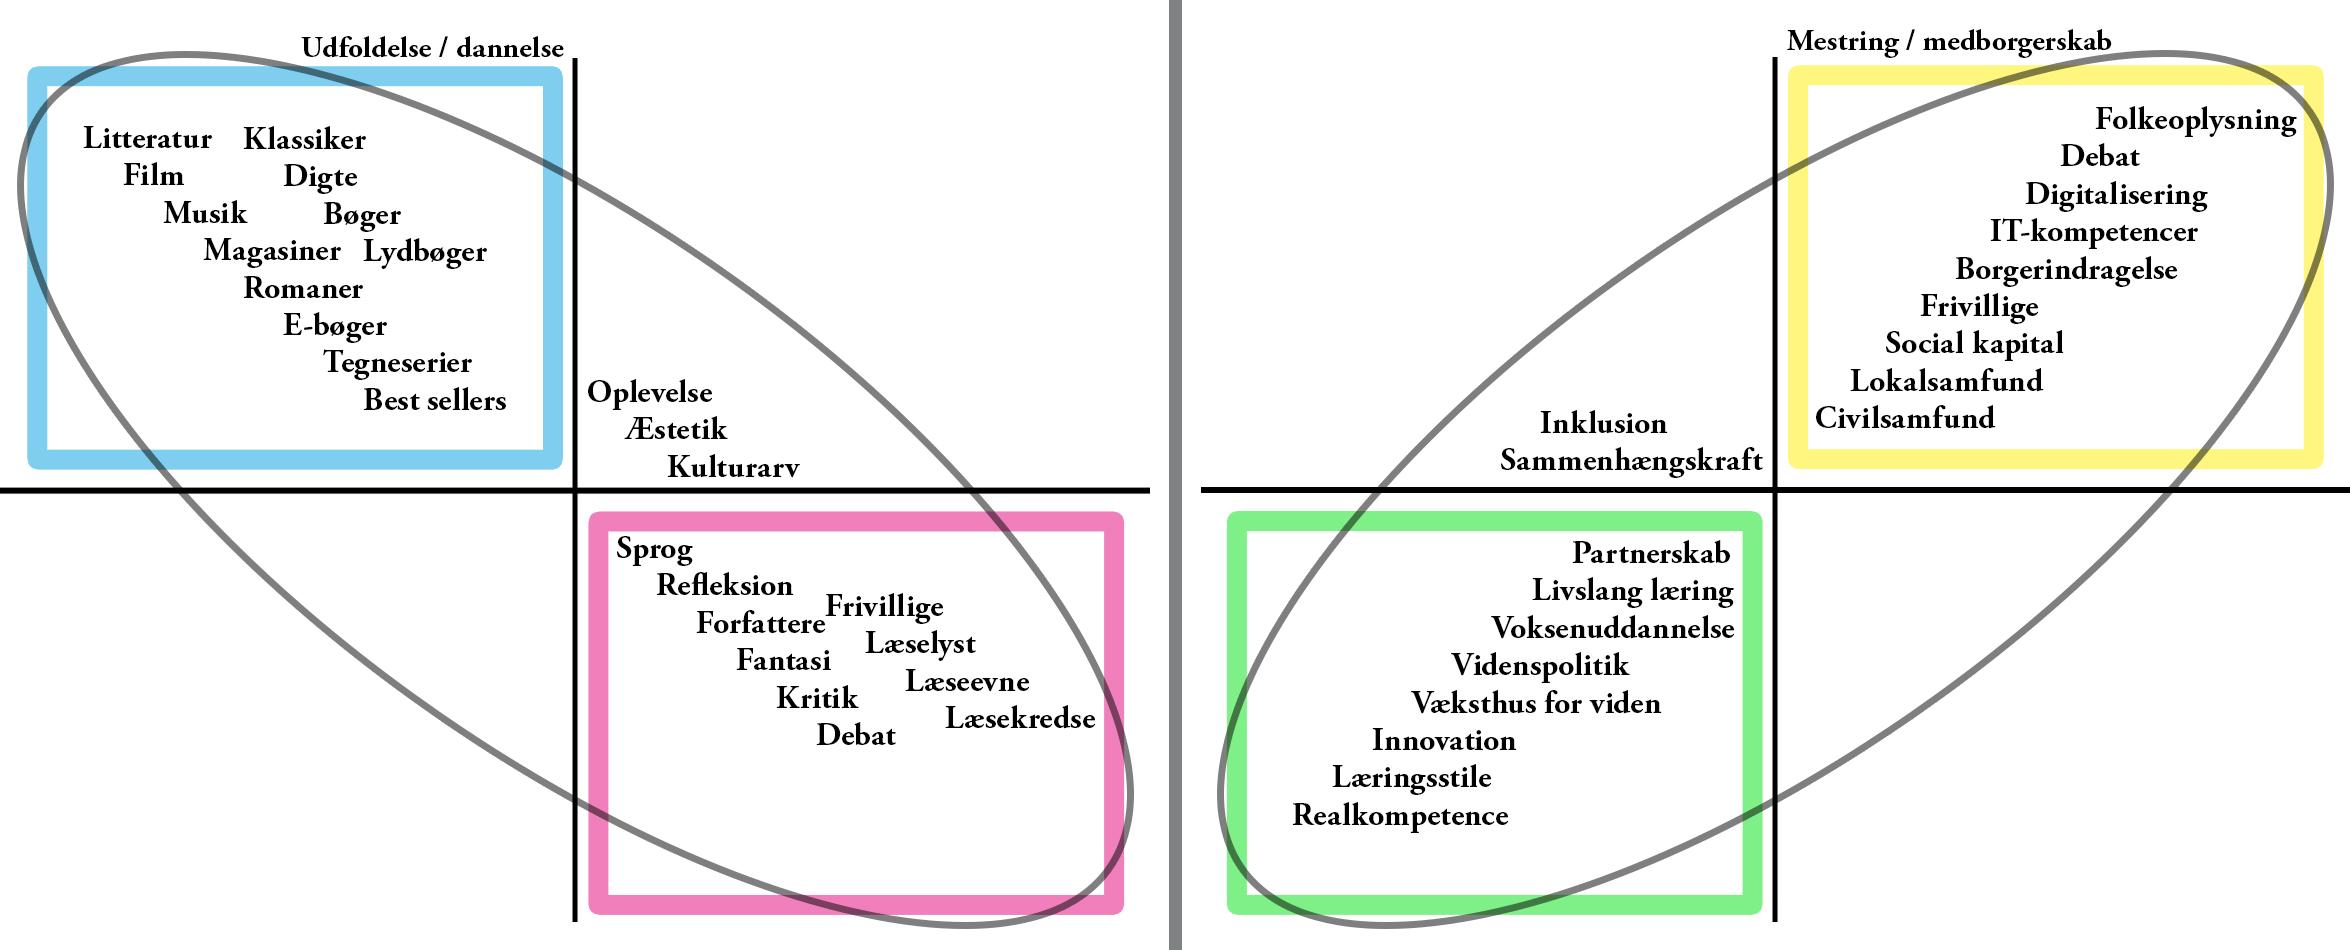 Figur 4 (se note 1)